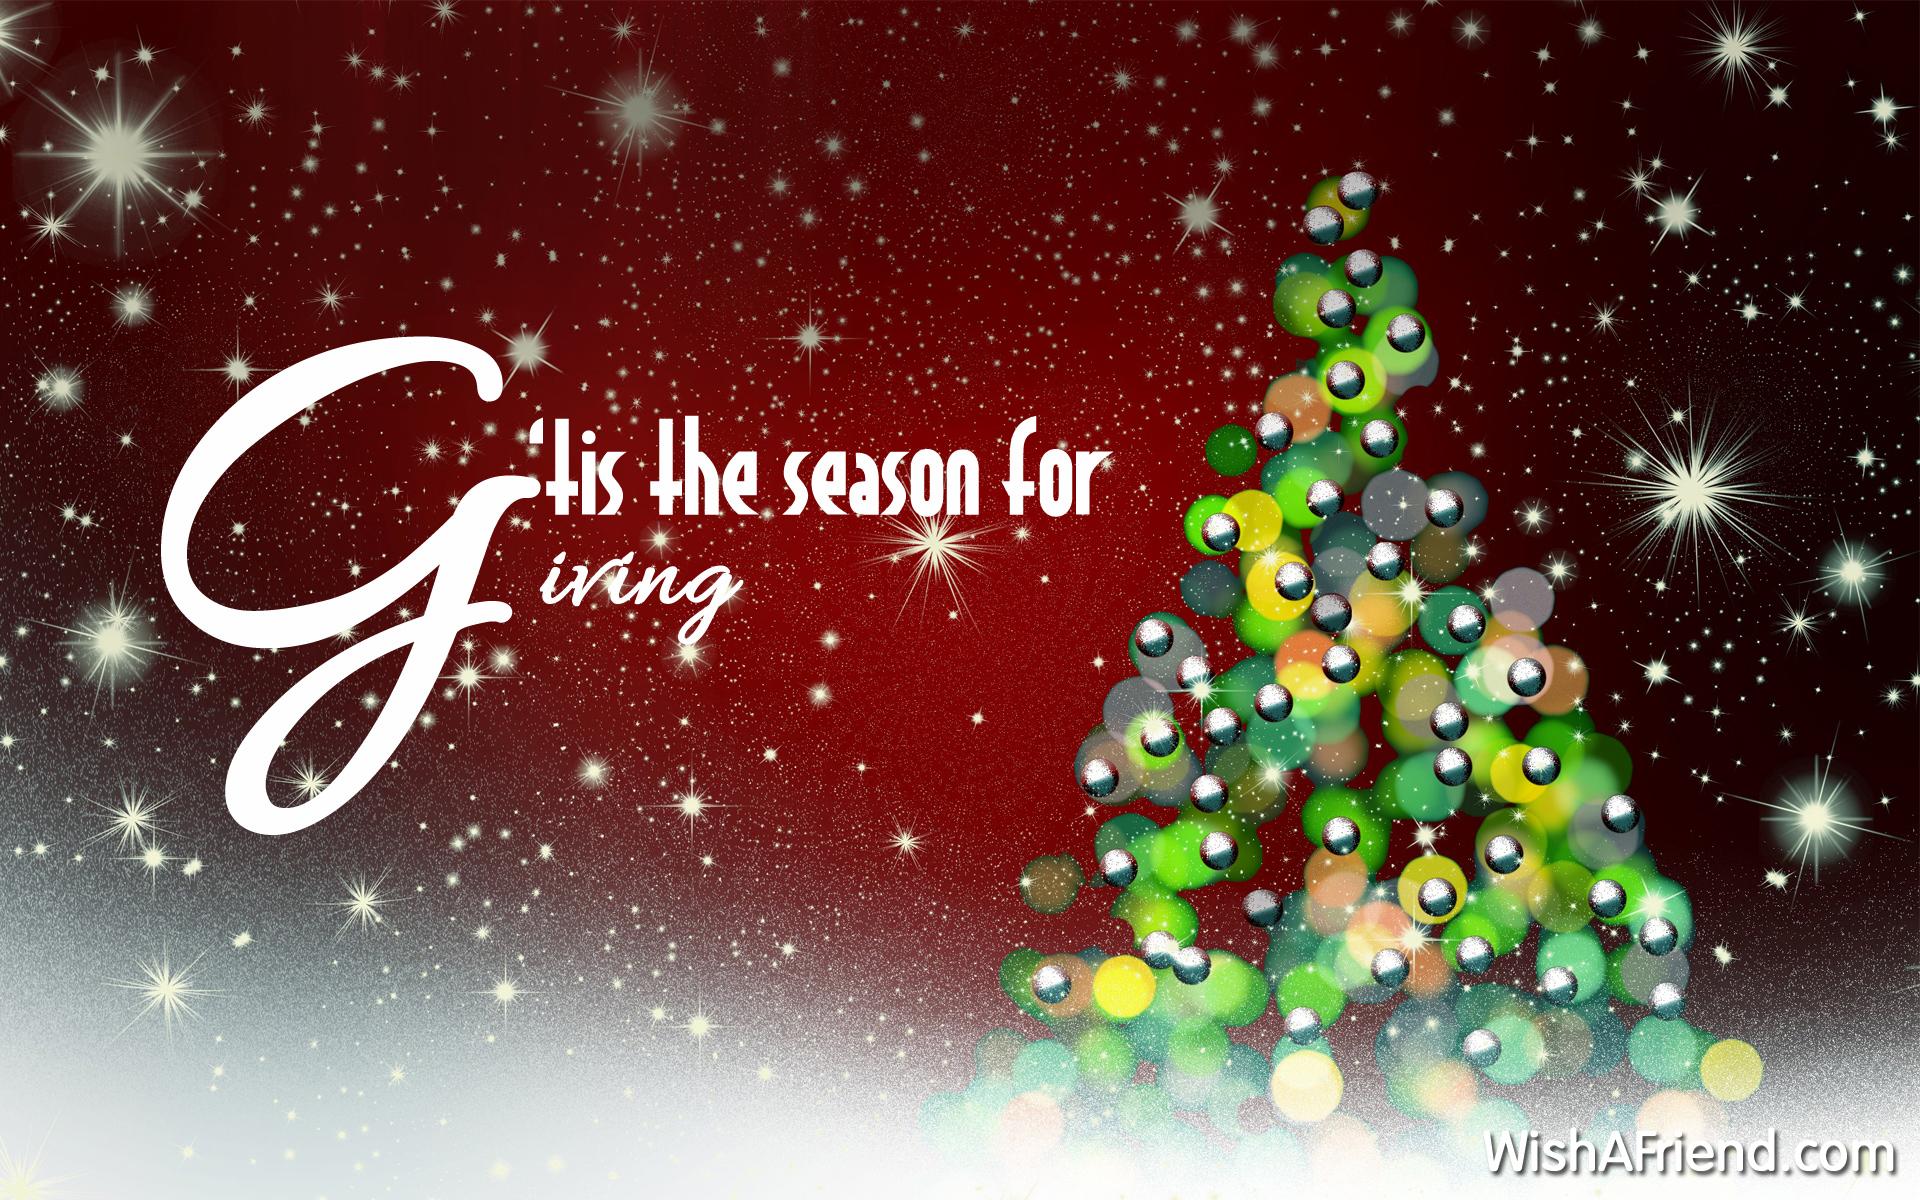 tis the season for giving